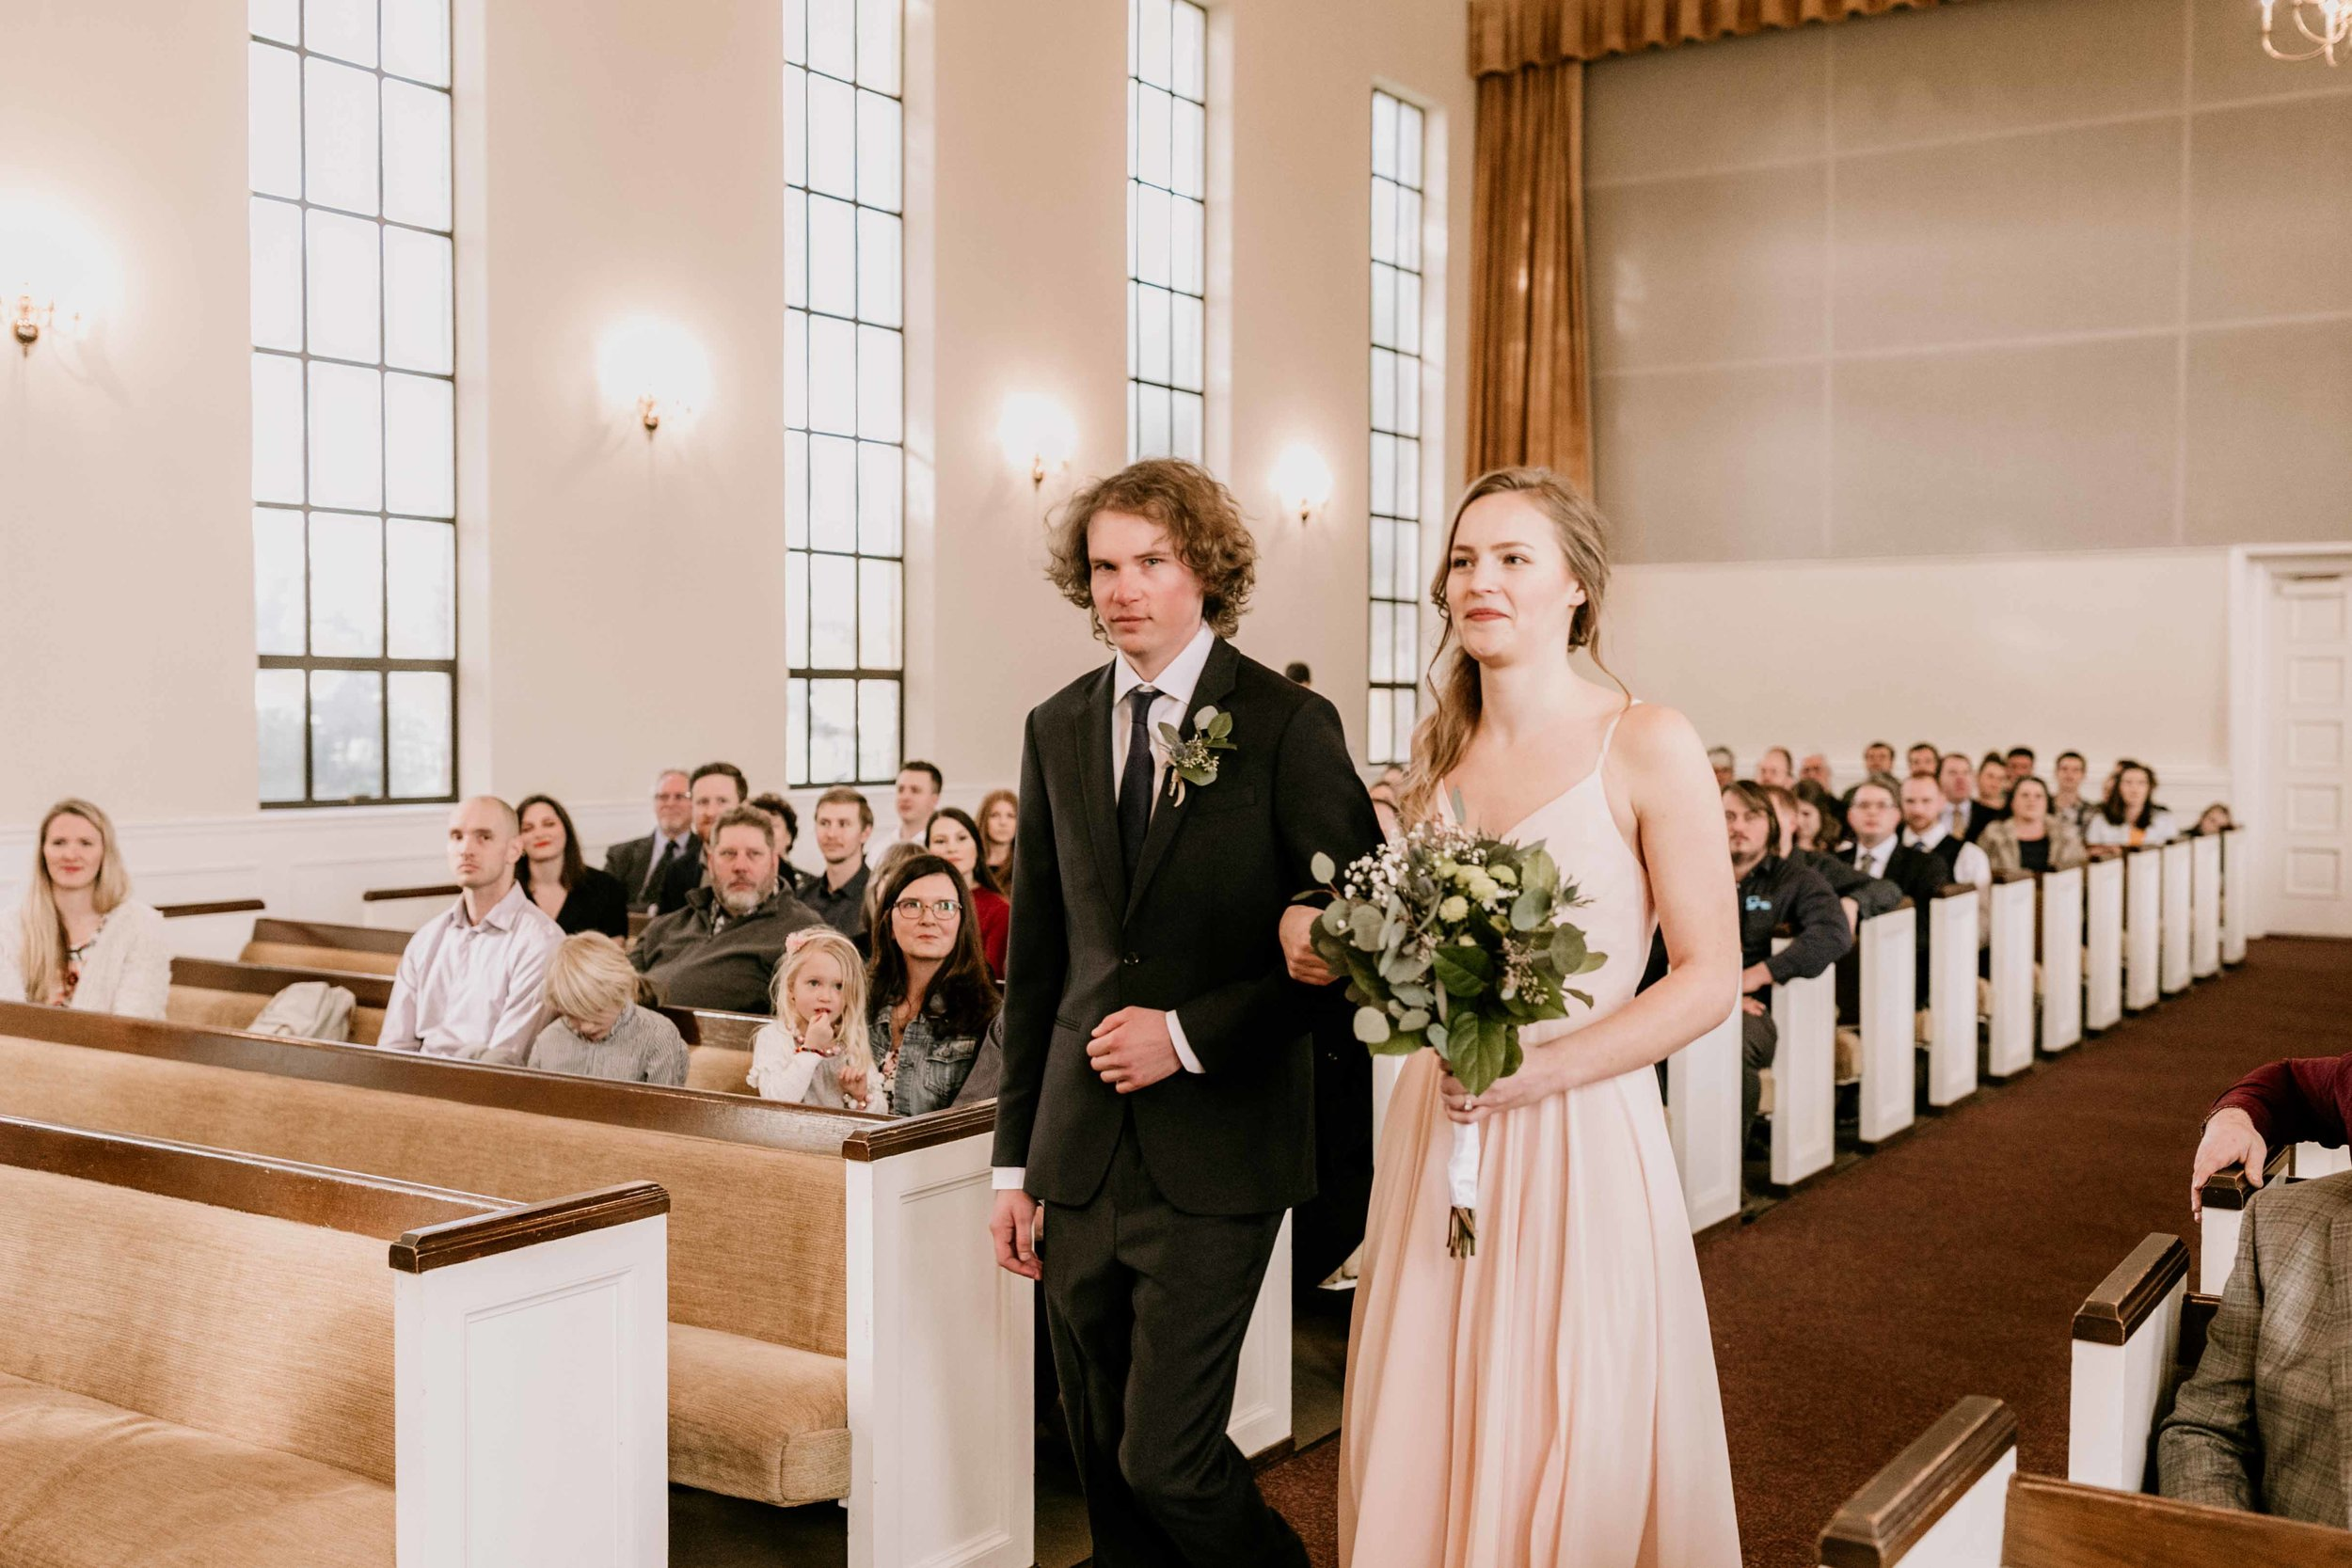 kilworth-memorial-chapel-wedding-60.jpg